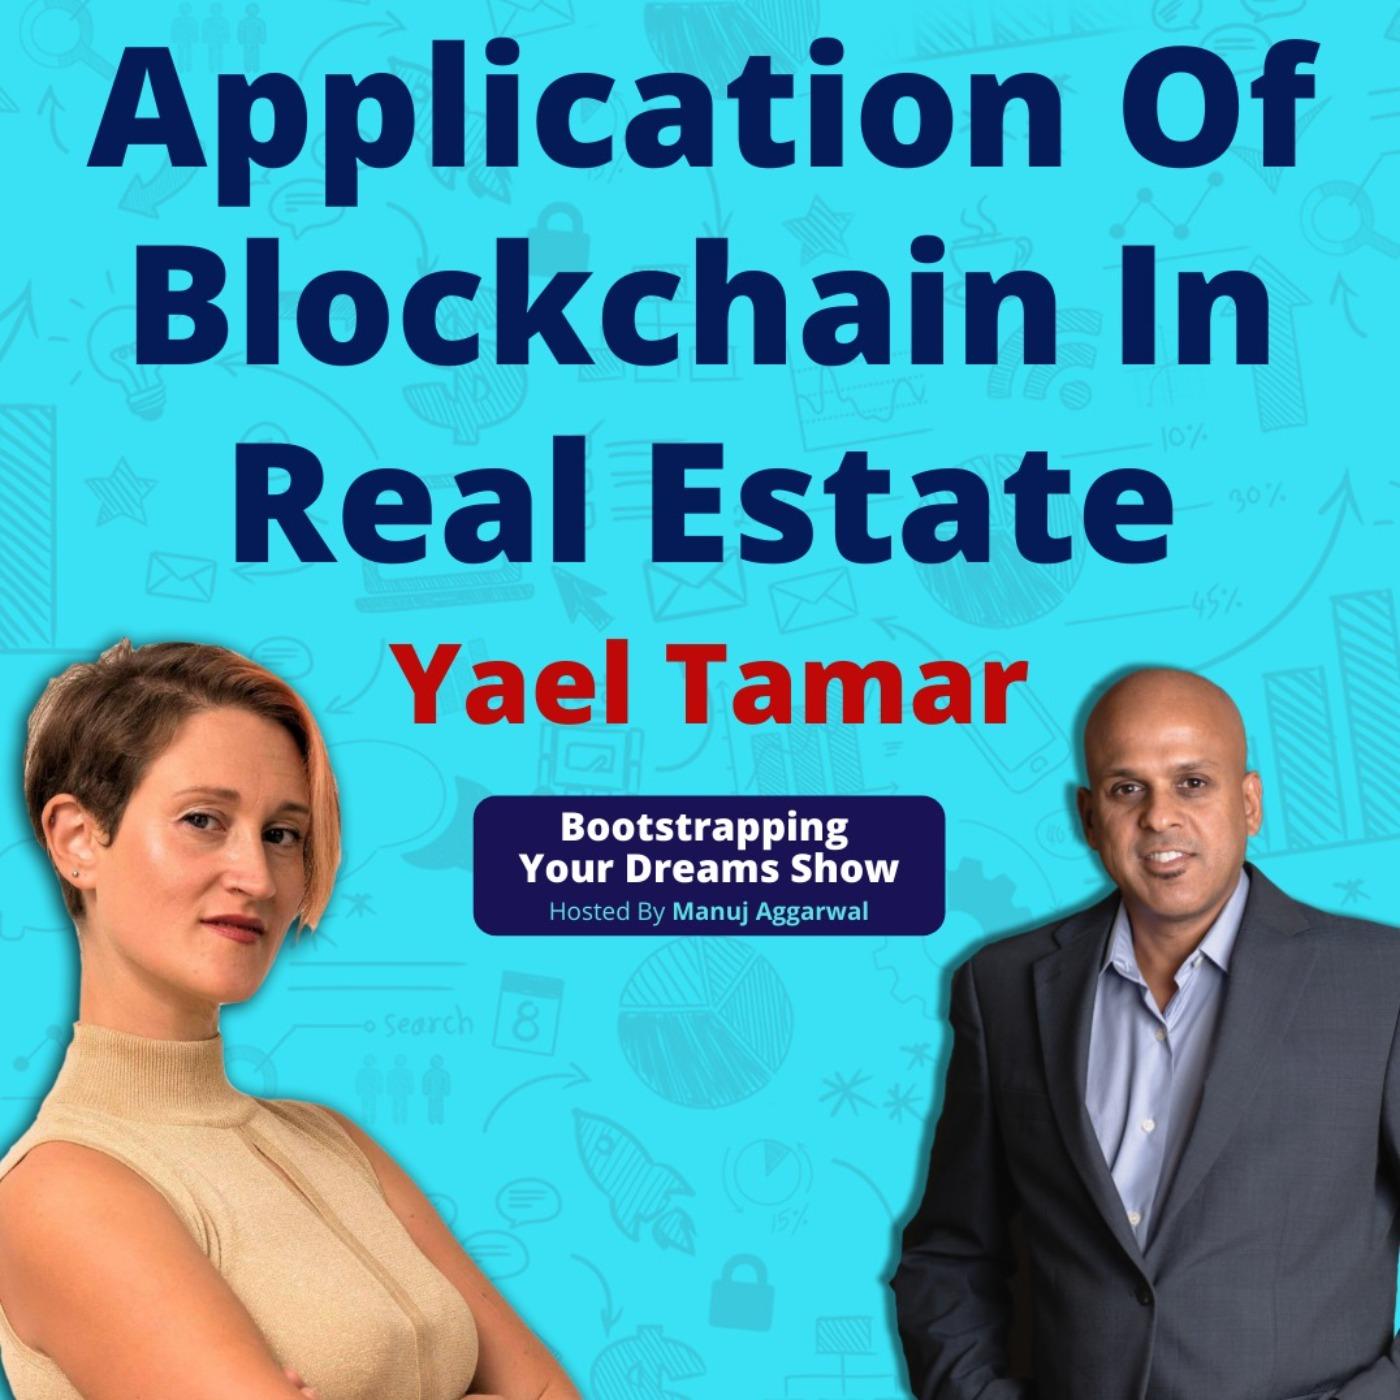 #169 Blockchain Technology   Application of blockchain in real estate   Emerging technologies   Yael Tamar